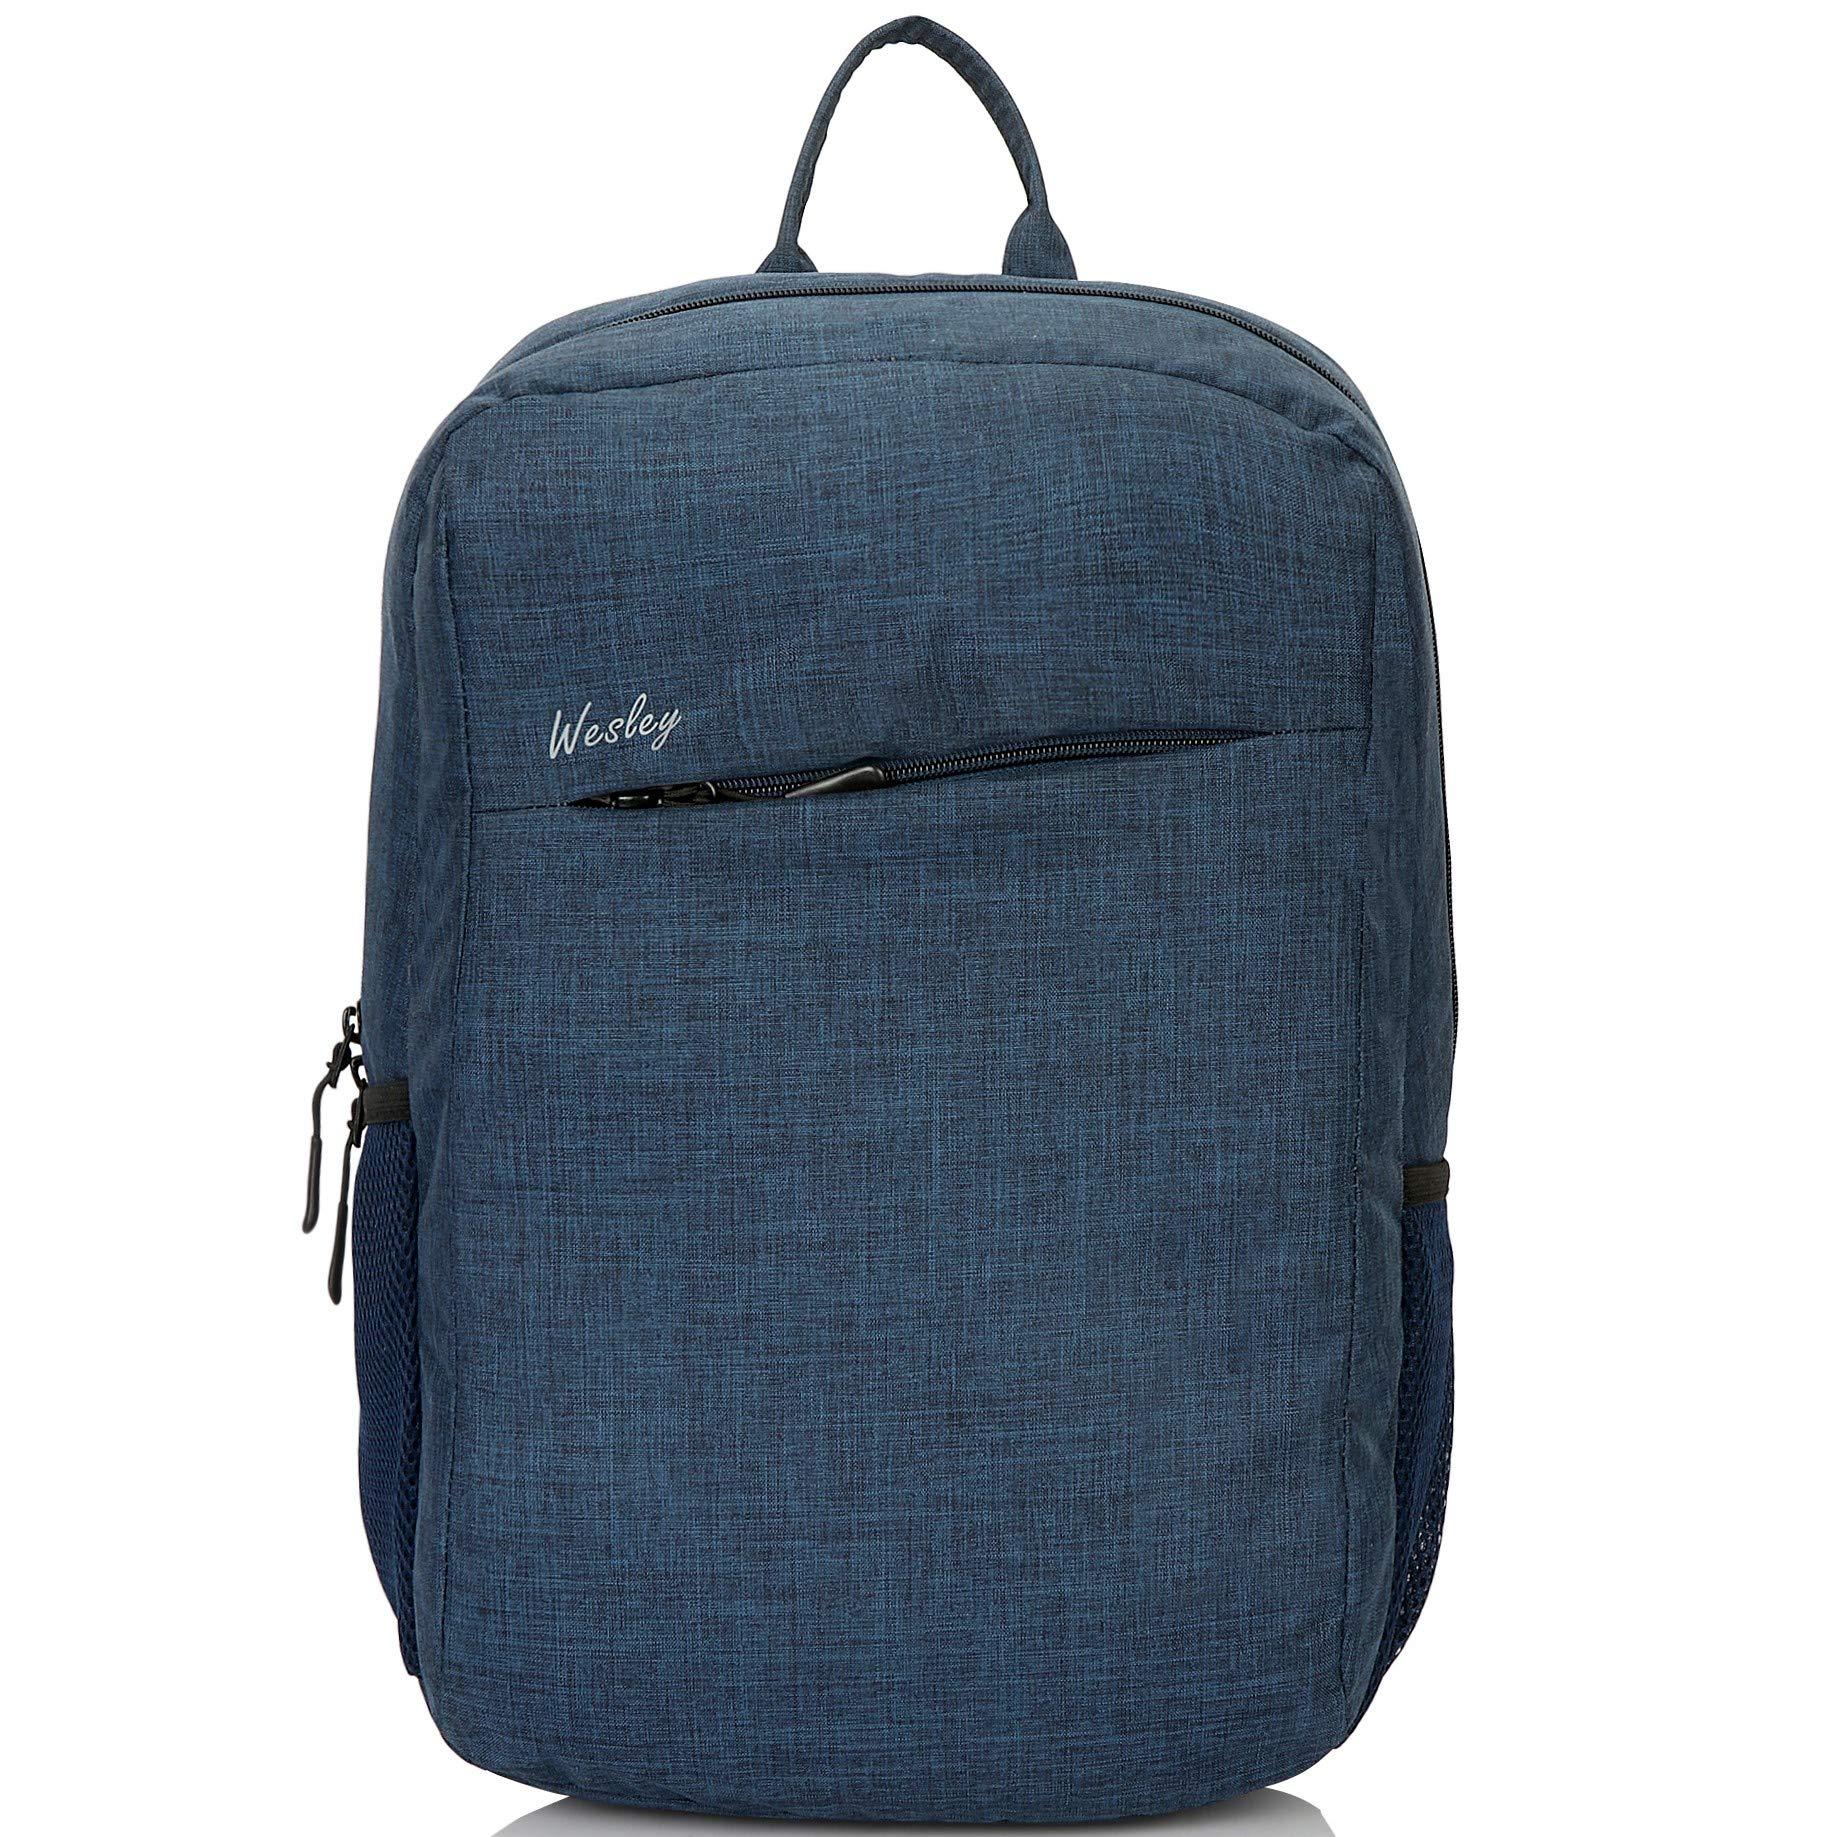 Wesley Milestone 15.6 inch 25 L Casual Waterproof Laptop Backpack/Office Bag/School Bag/College Bag/Business Bag/Unisex Travel Backpack product image